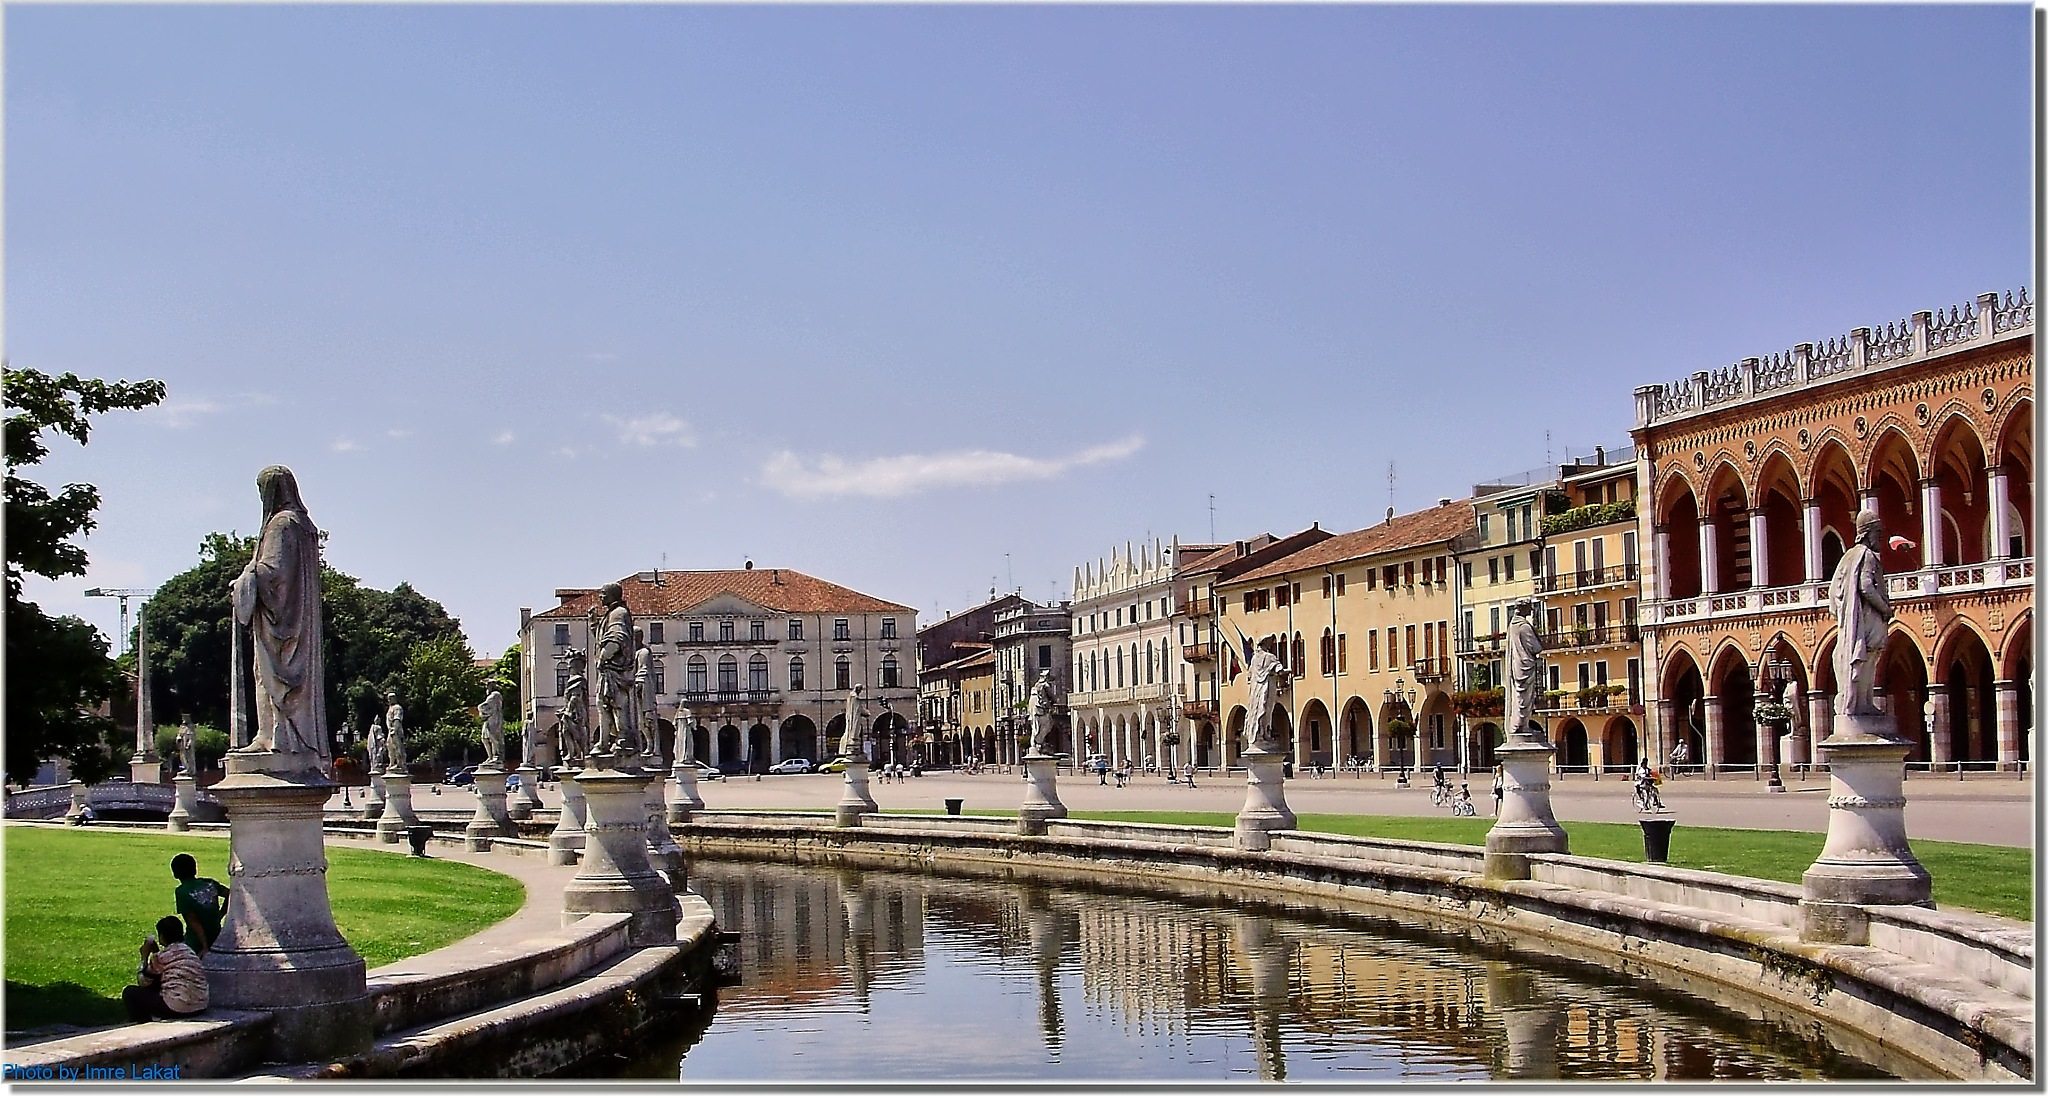 Piazza Prato della Valle, 12, 35123 Padova PD, Olaszország  by Imre Lakat